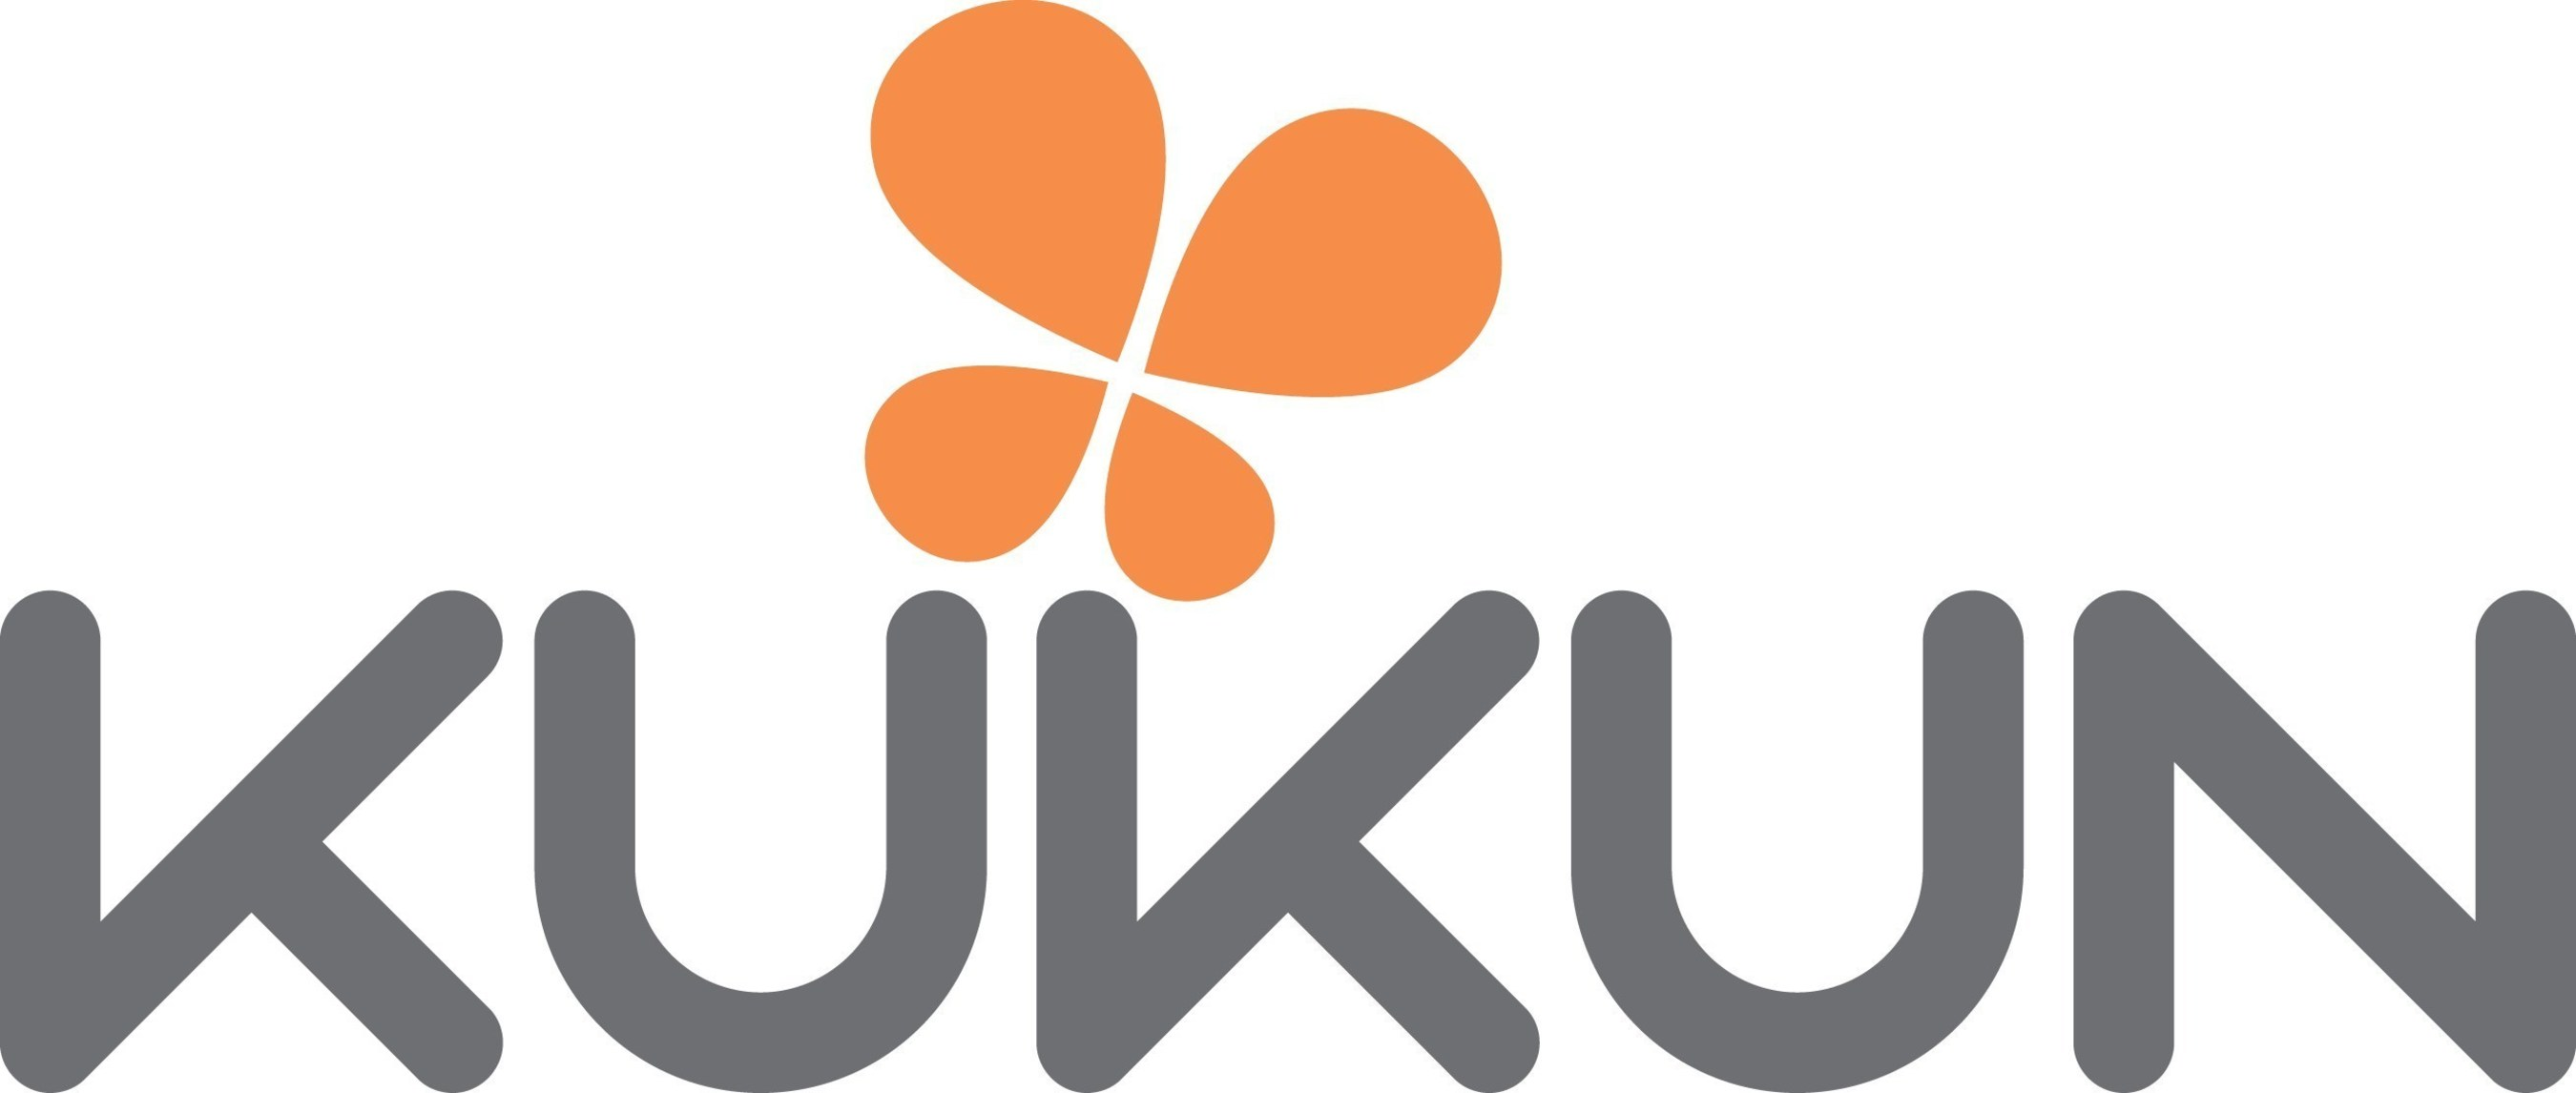 「kukun」の画像検索結果